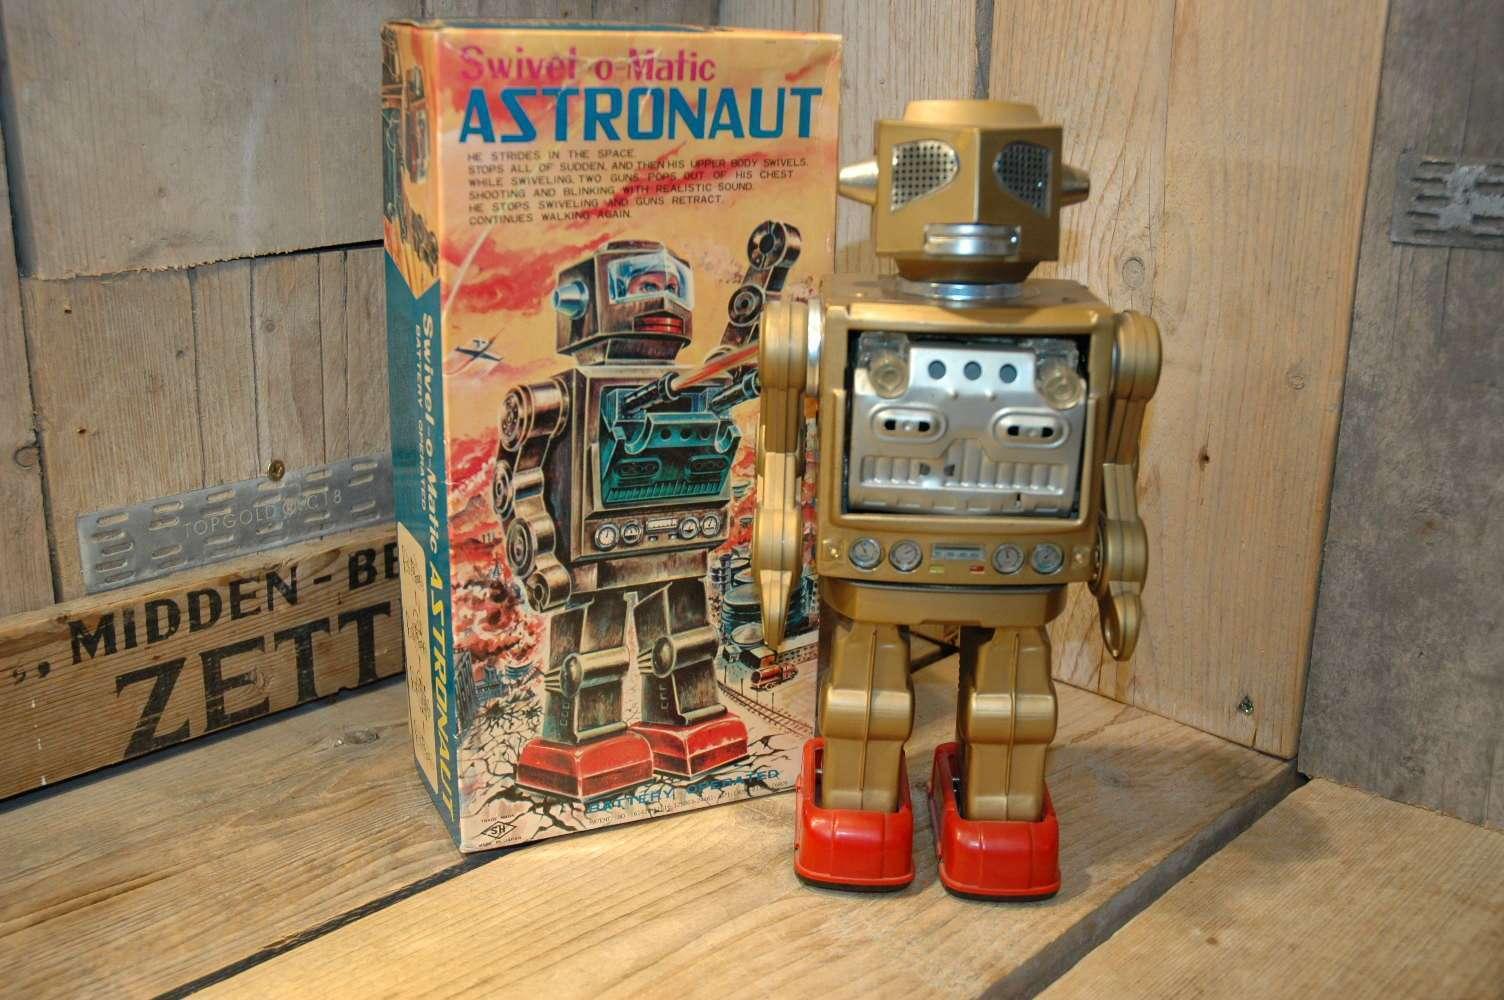 horikawa - Rotate O'Matic Super Astronaut